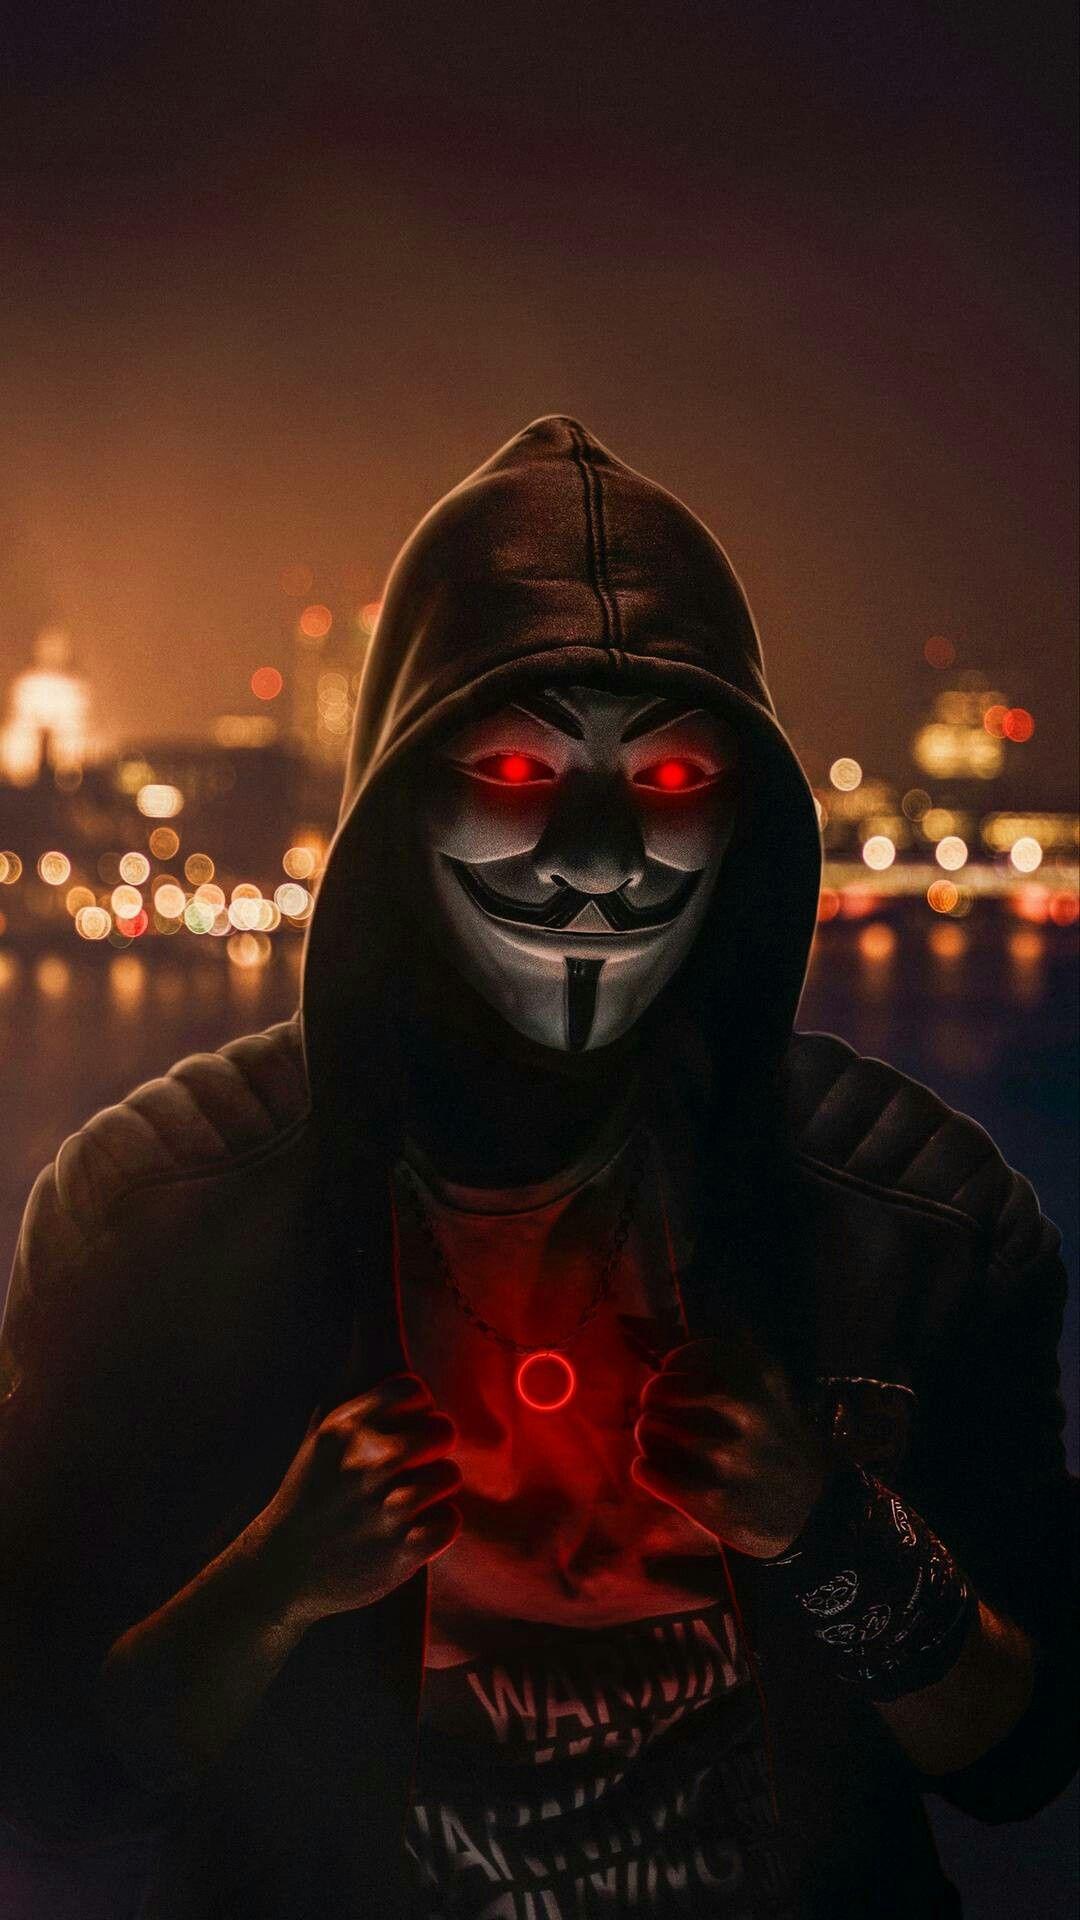 Pin By Hamza Afridi On Mask In 2020 Joker Iphone Wallpaper